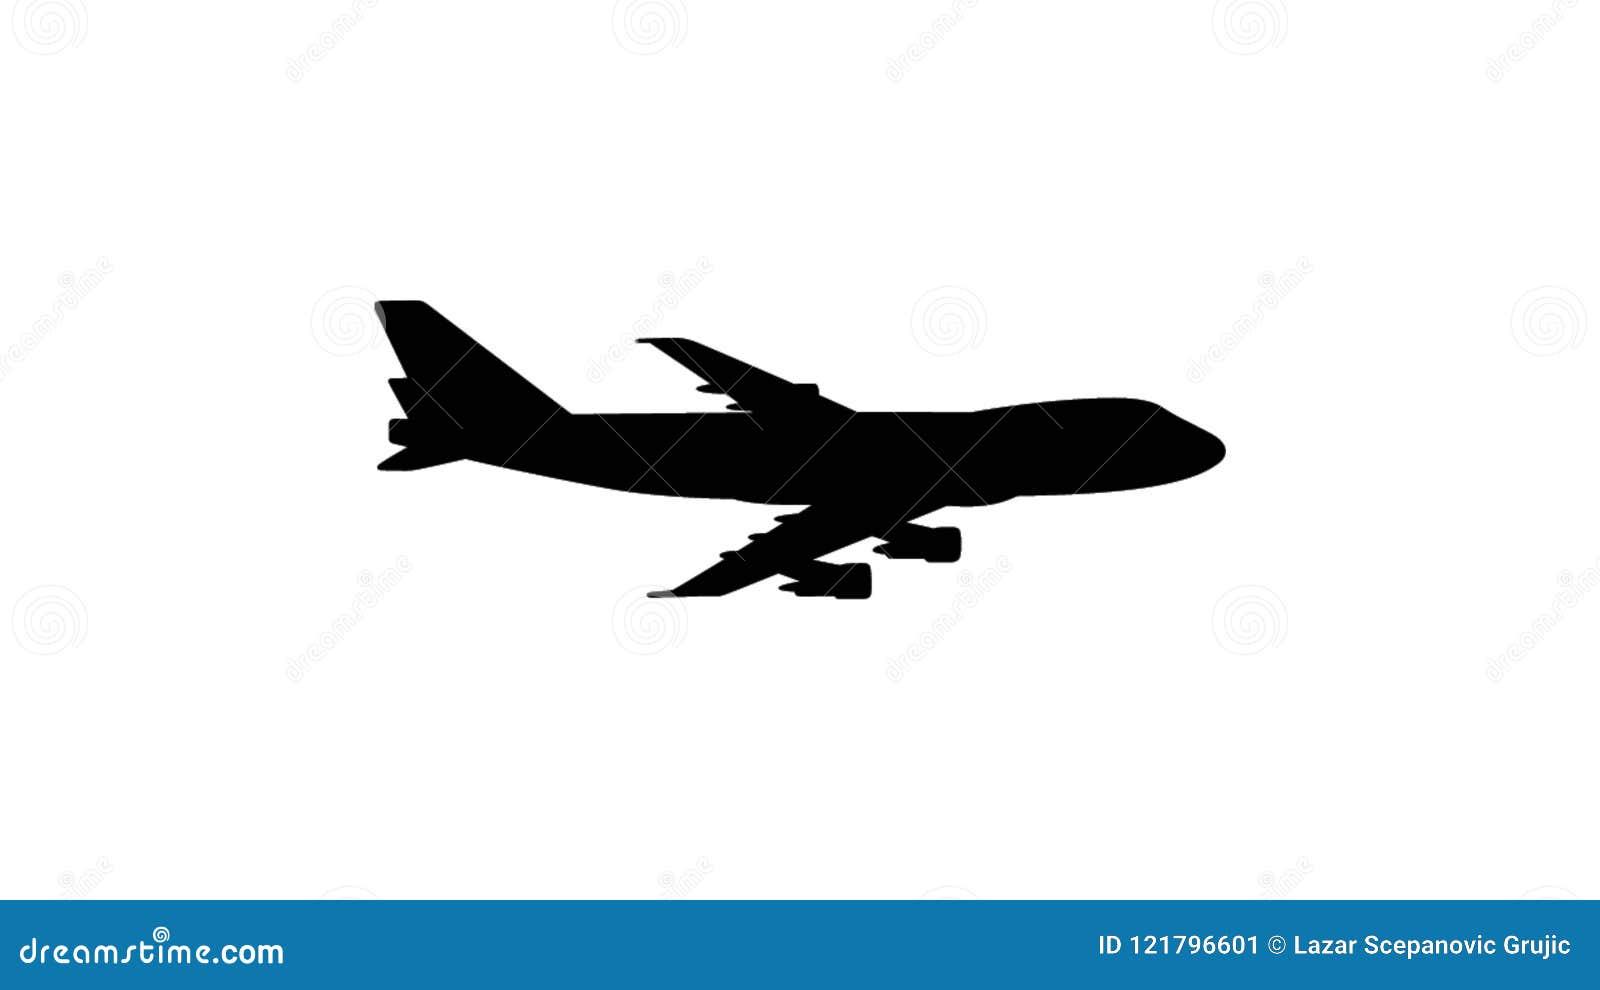 Illustration of a flying plane